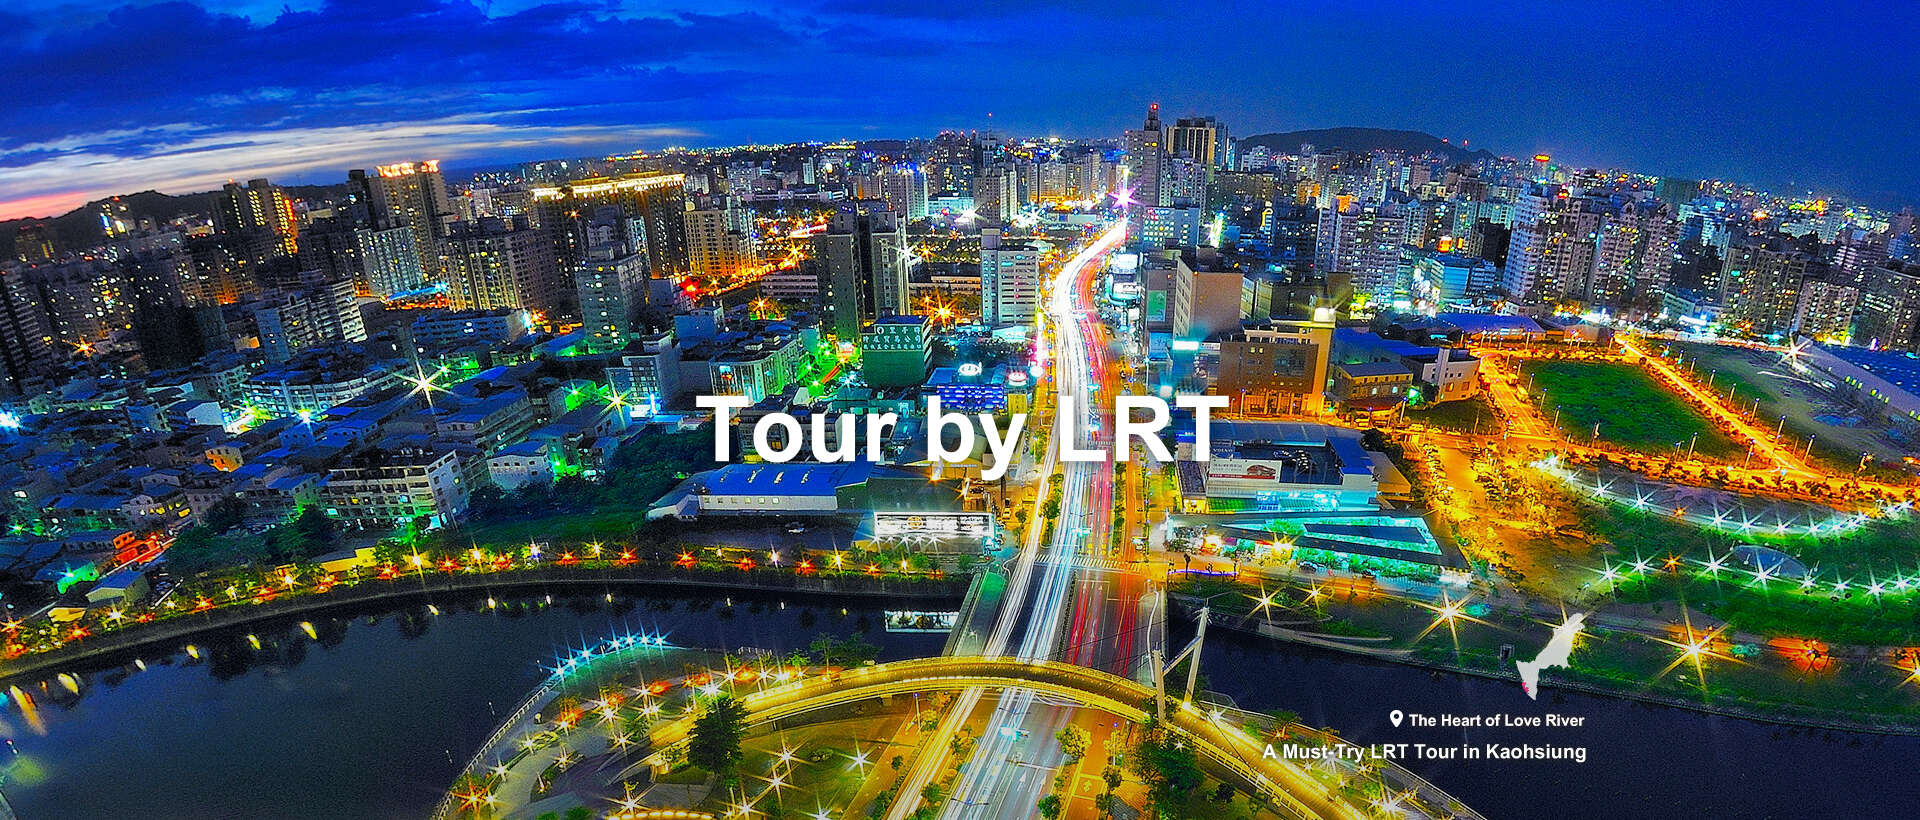 Tour by LRT